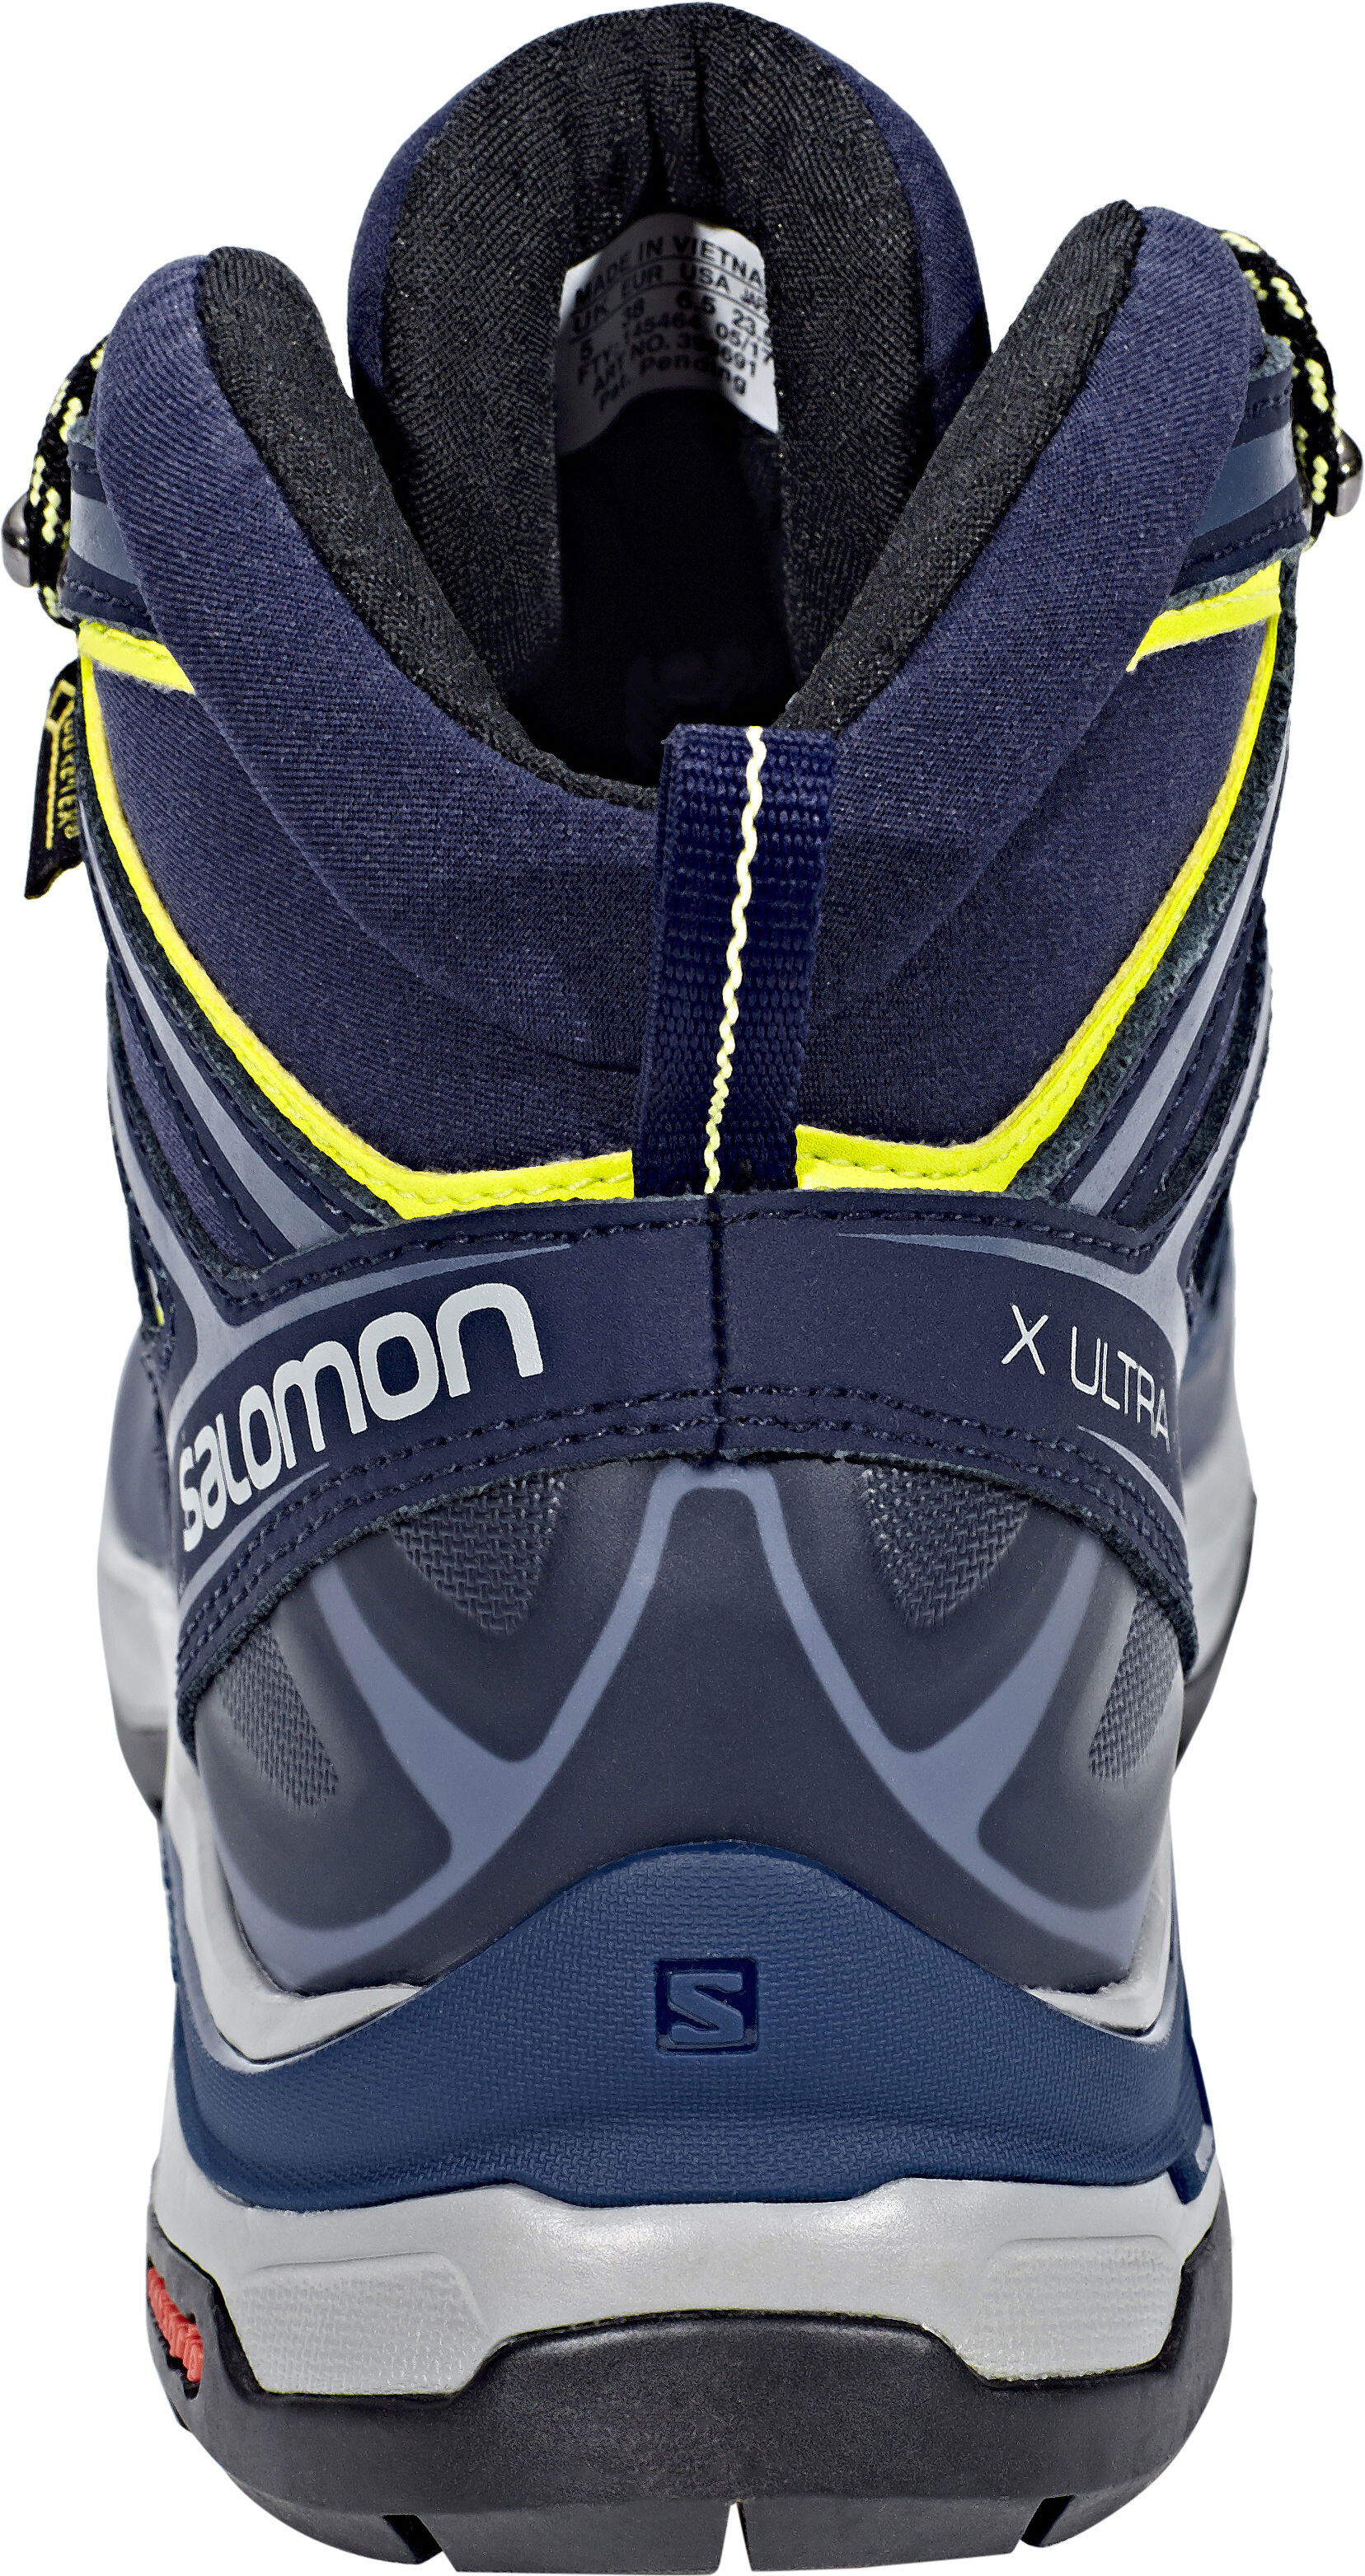 new concept 568e0 c3cc9 Salomon X Ultra 3 Mid GTX - Chaussures Femme - bleu